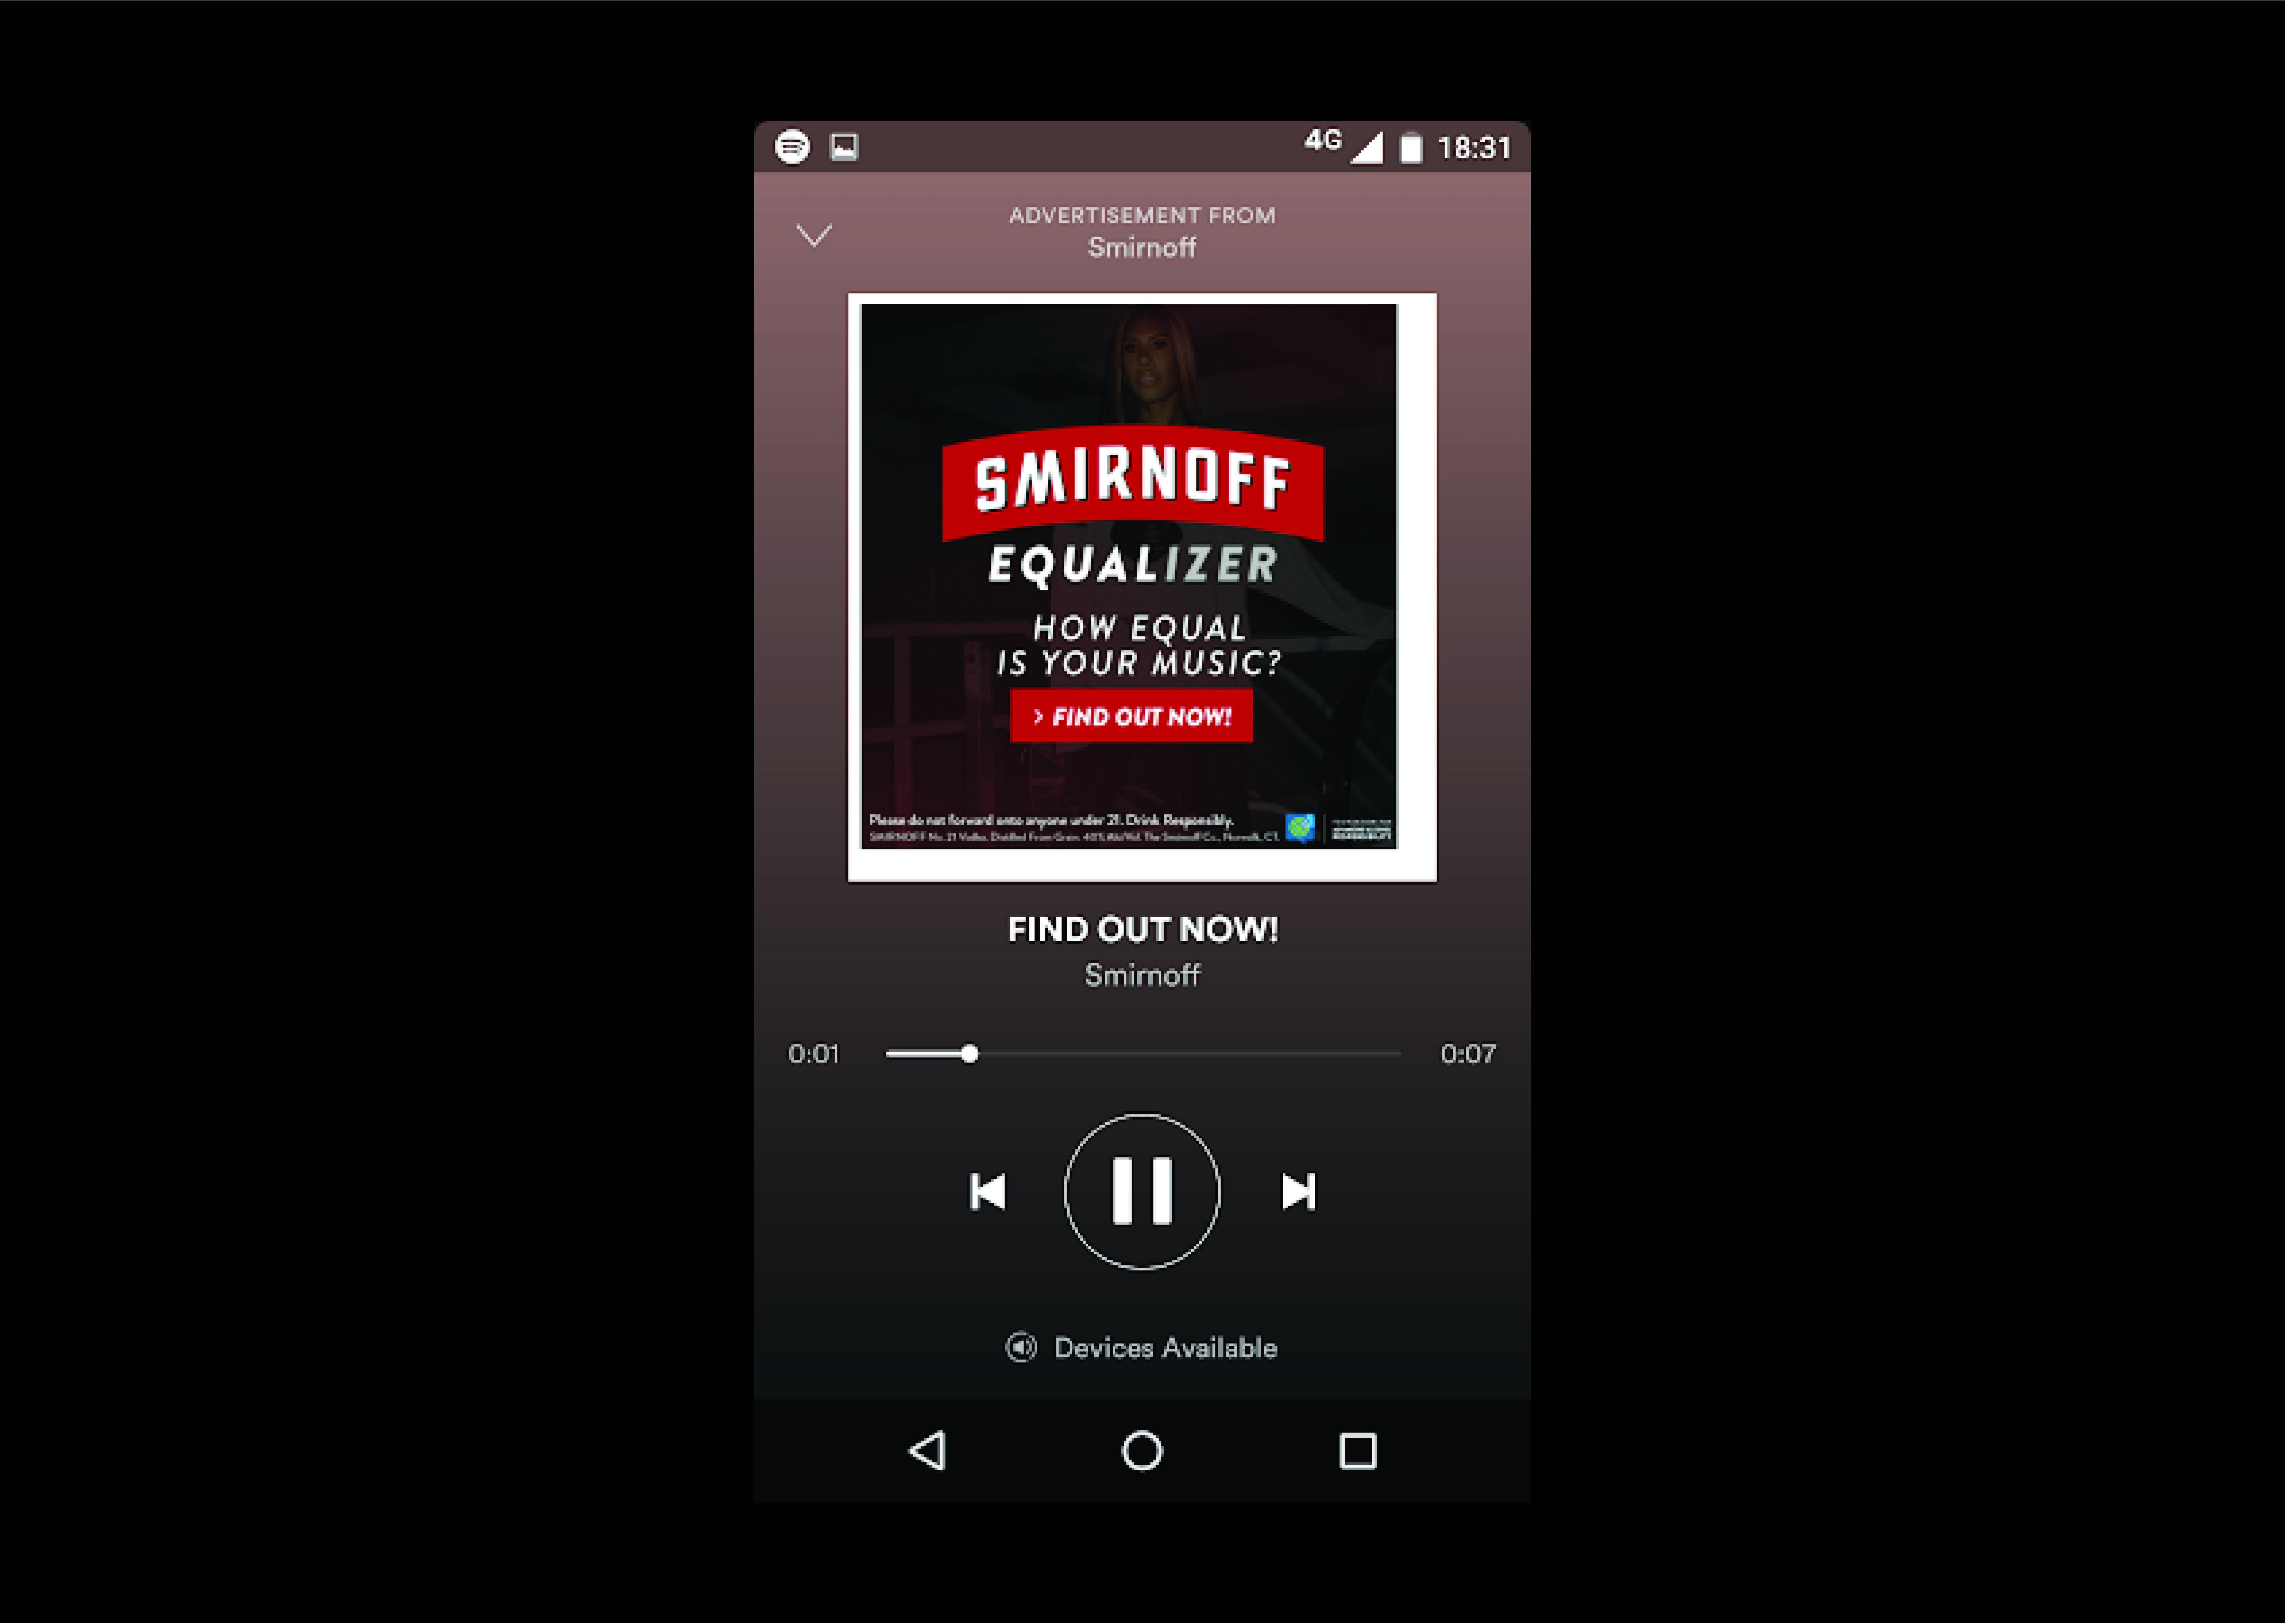 Smirnoff Equalizer - The Shorty Awards